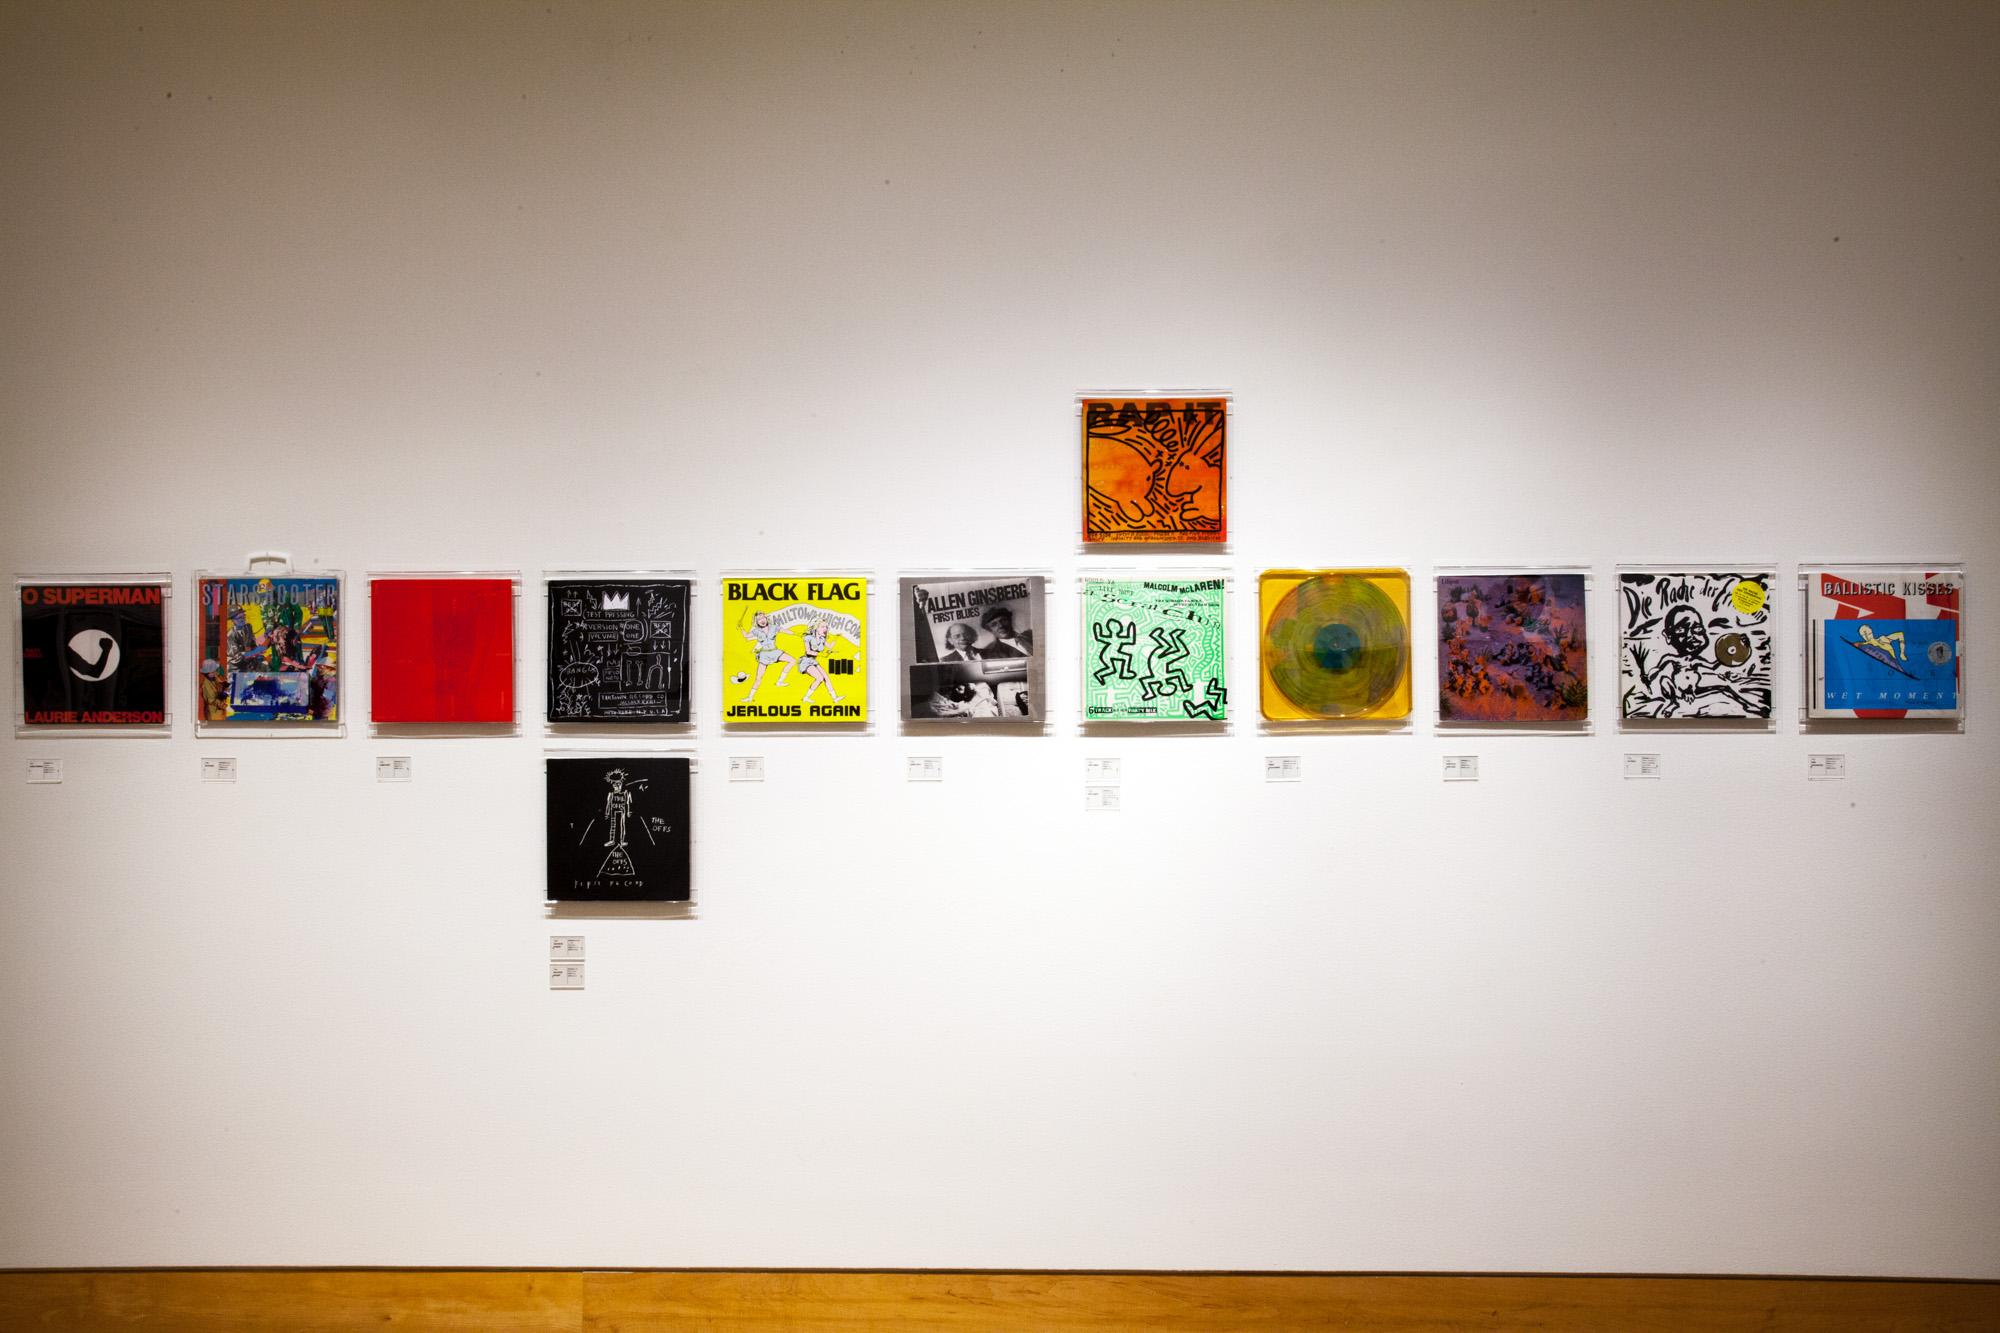 The new Vinyl Art show at Fraenkel Gallery